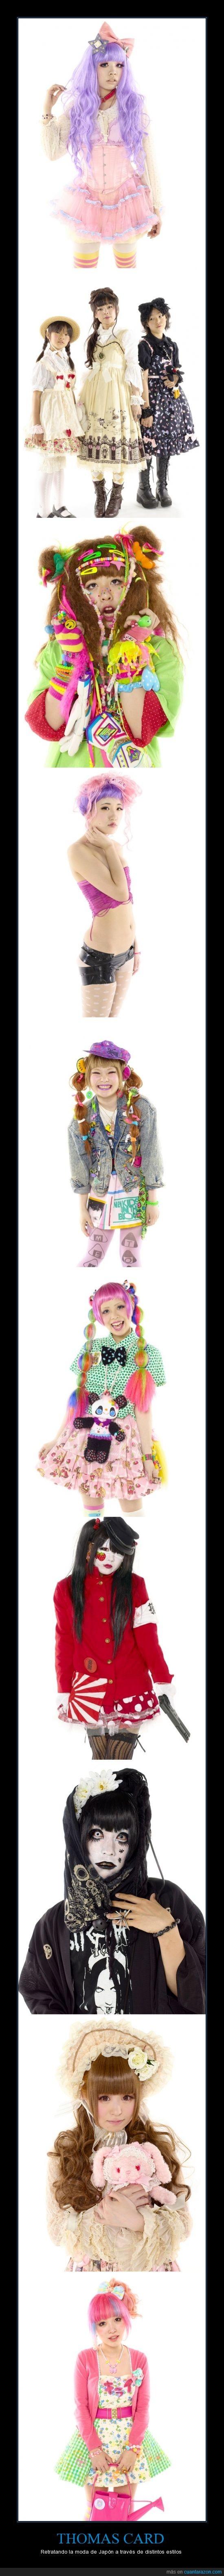 color,decora,goth,innocent,japon,lolita,moda,ropa,sweet